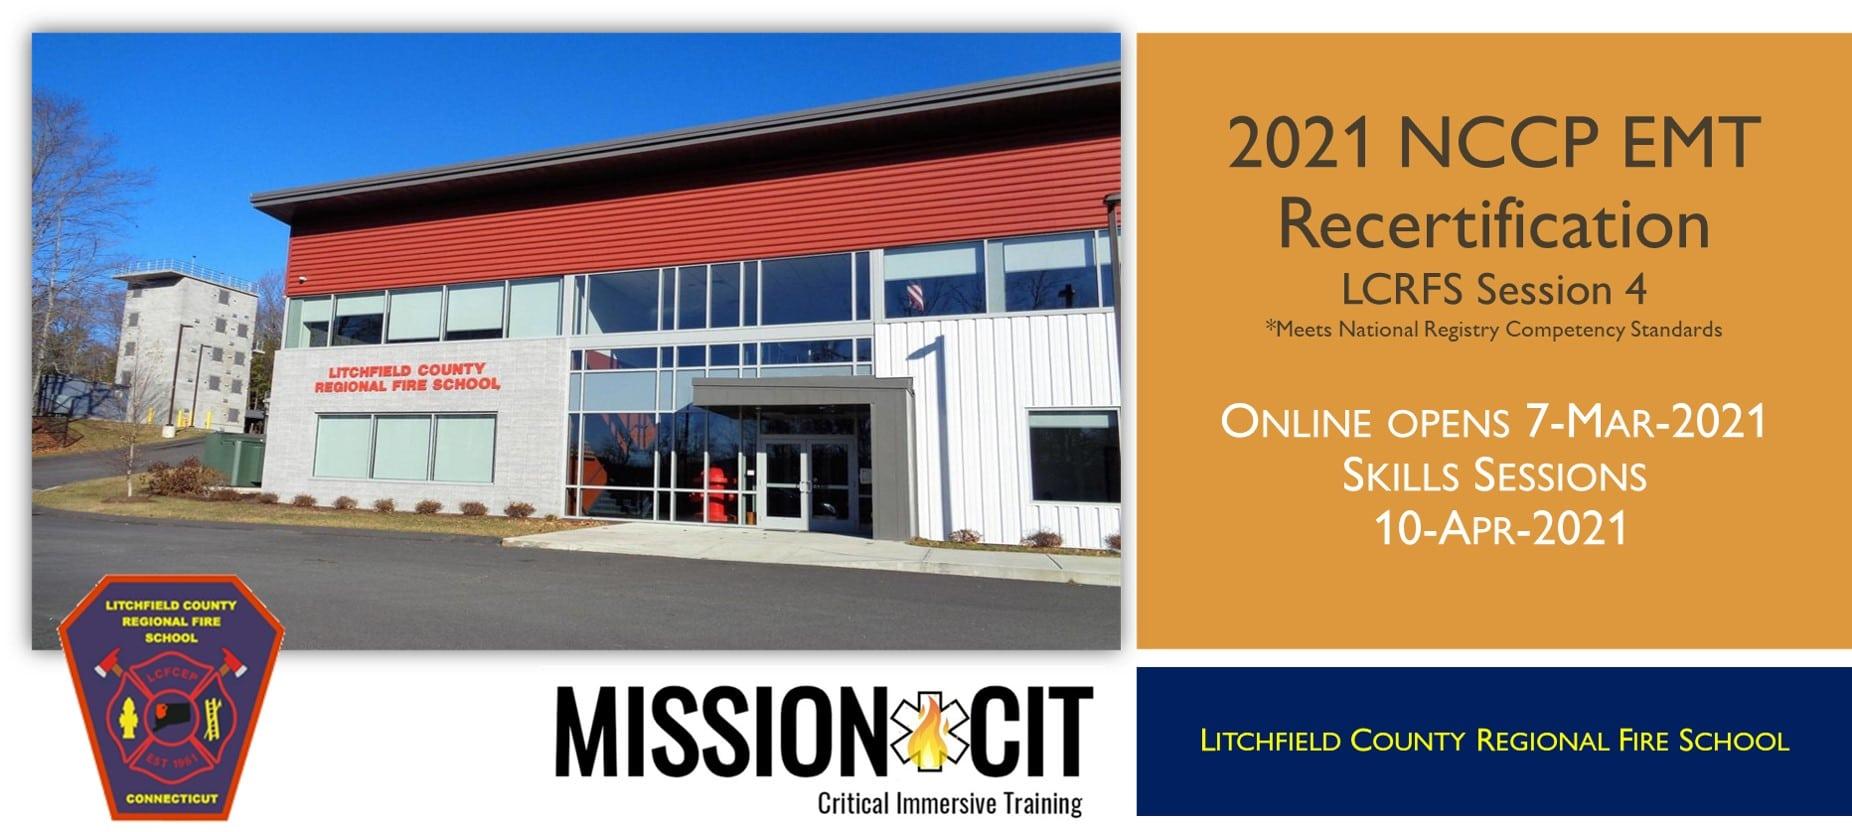 EMT NCCP 2021 Recertification Course | LCRFS Session 4